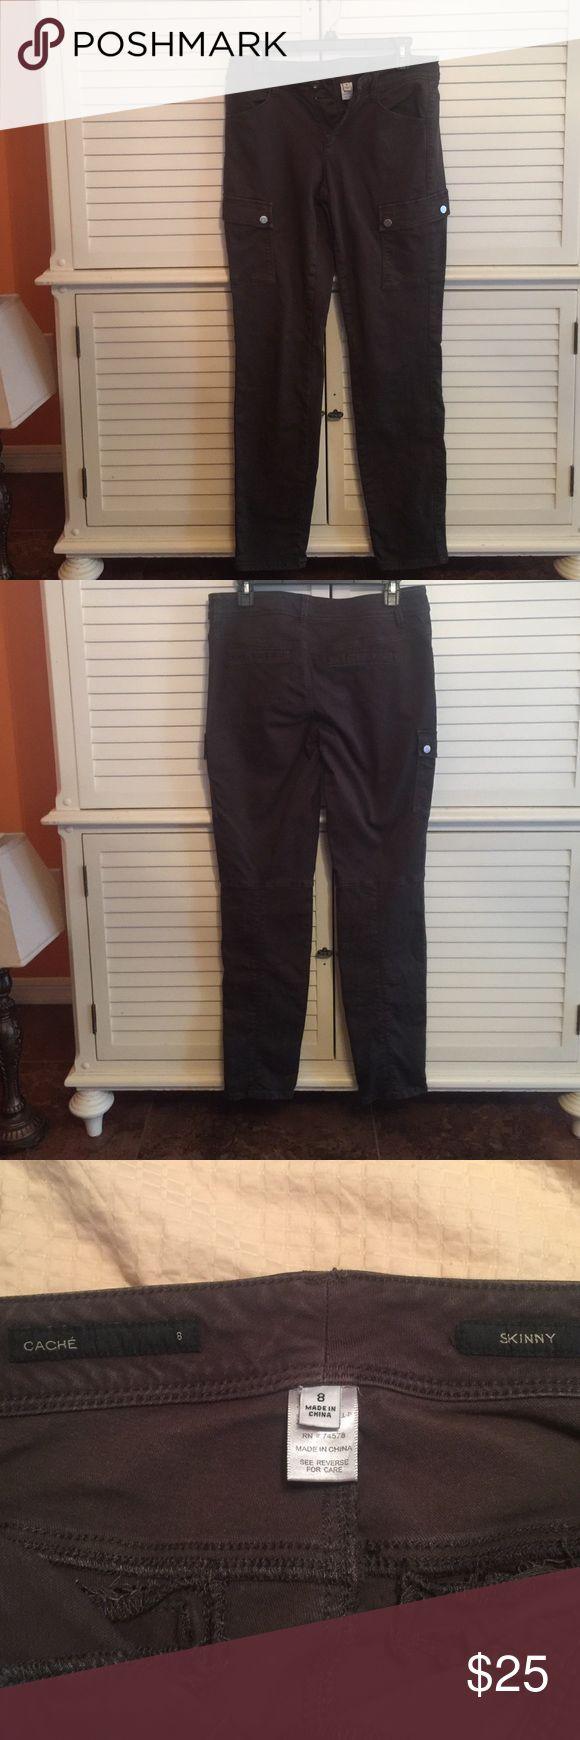 Cache skinny cargo jeans Cache brown , skinny cargo jeans in good condition Cache Jeans Skinny